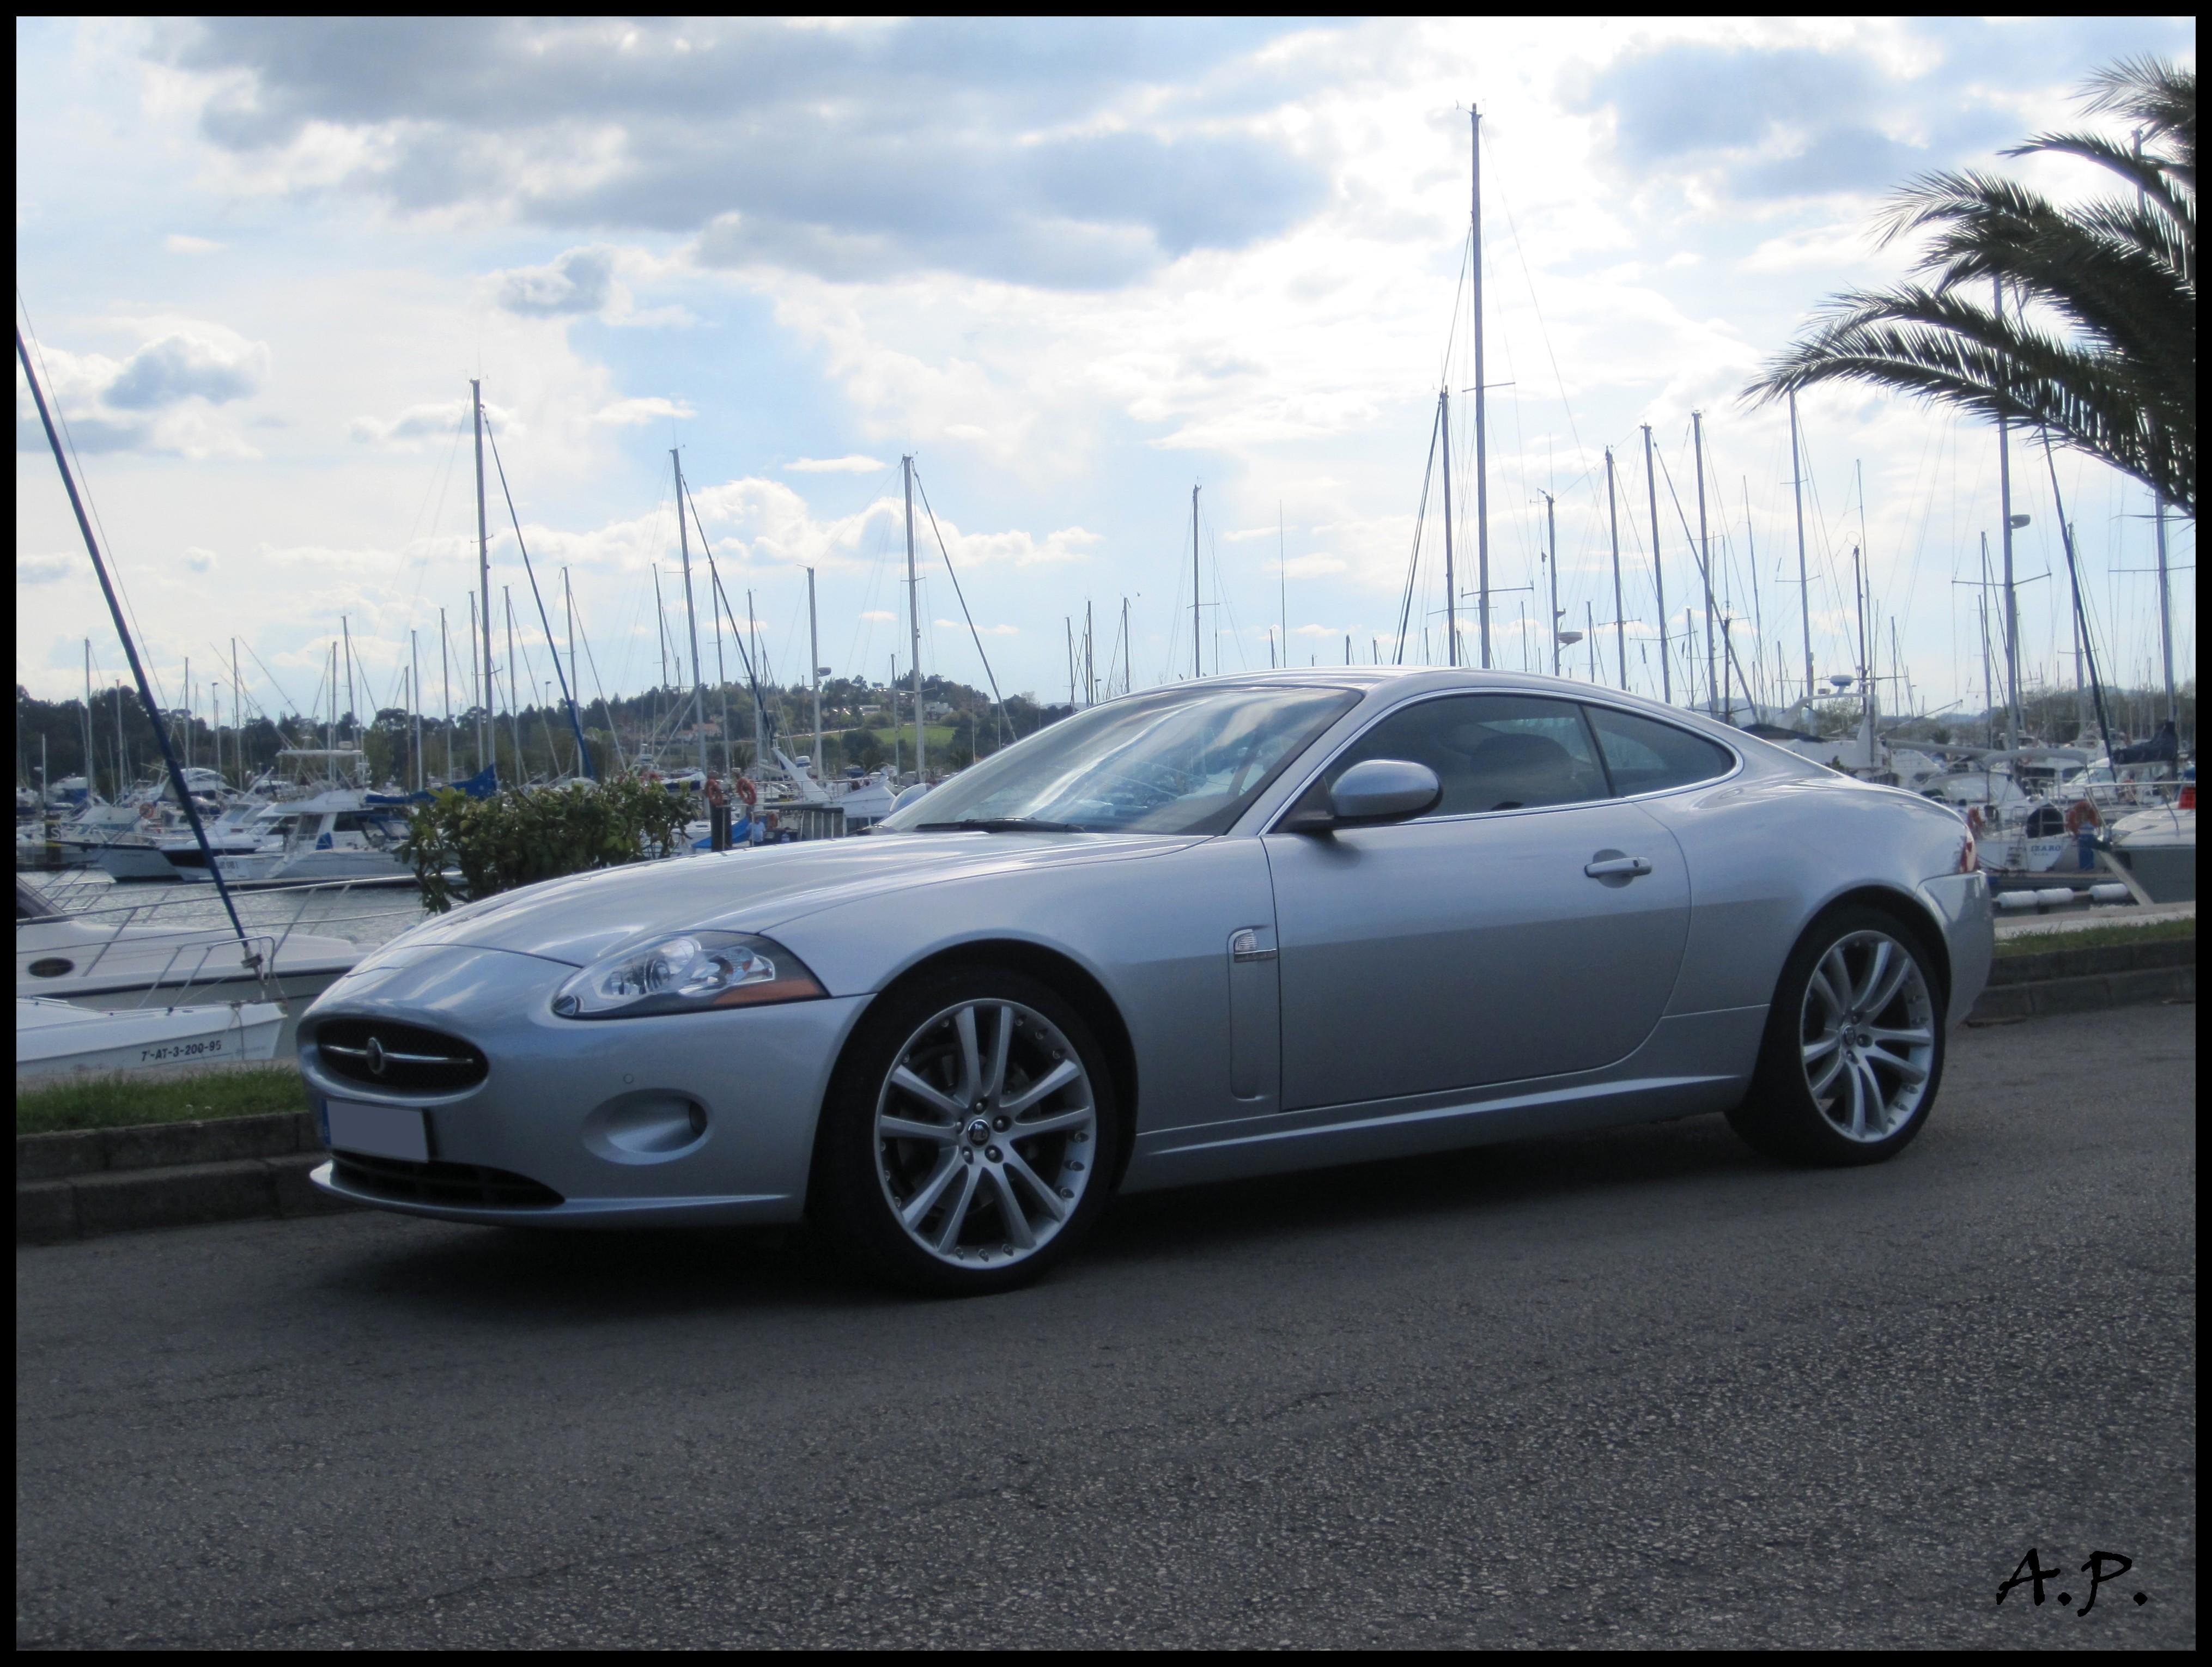 File:2006 Jaguar XK (4535430765).jpg - Wikimedia Commons